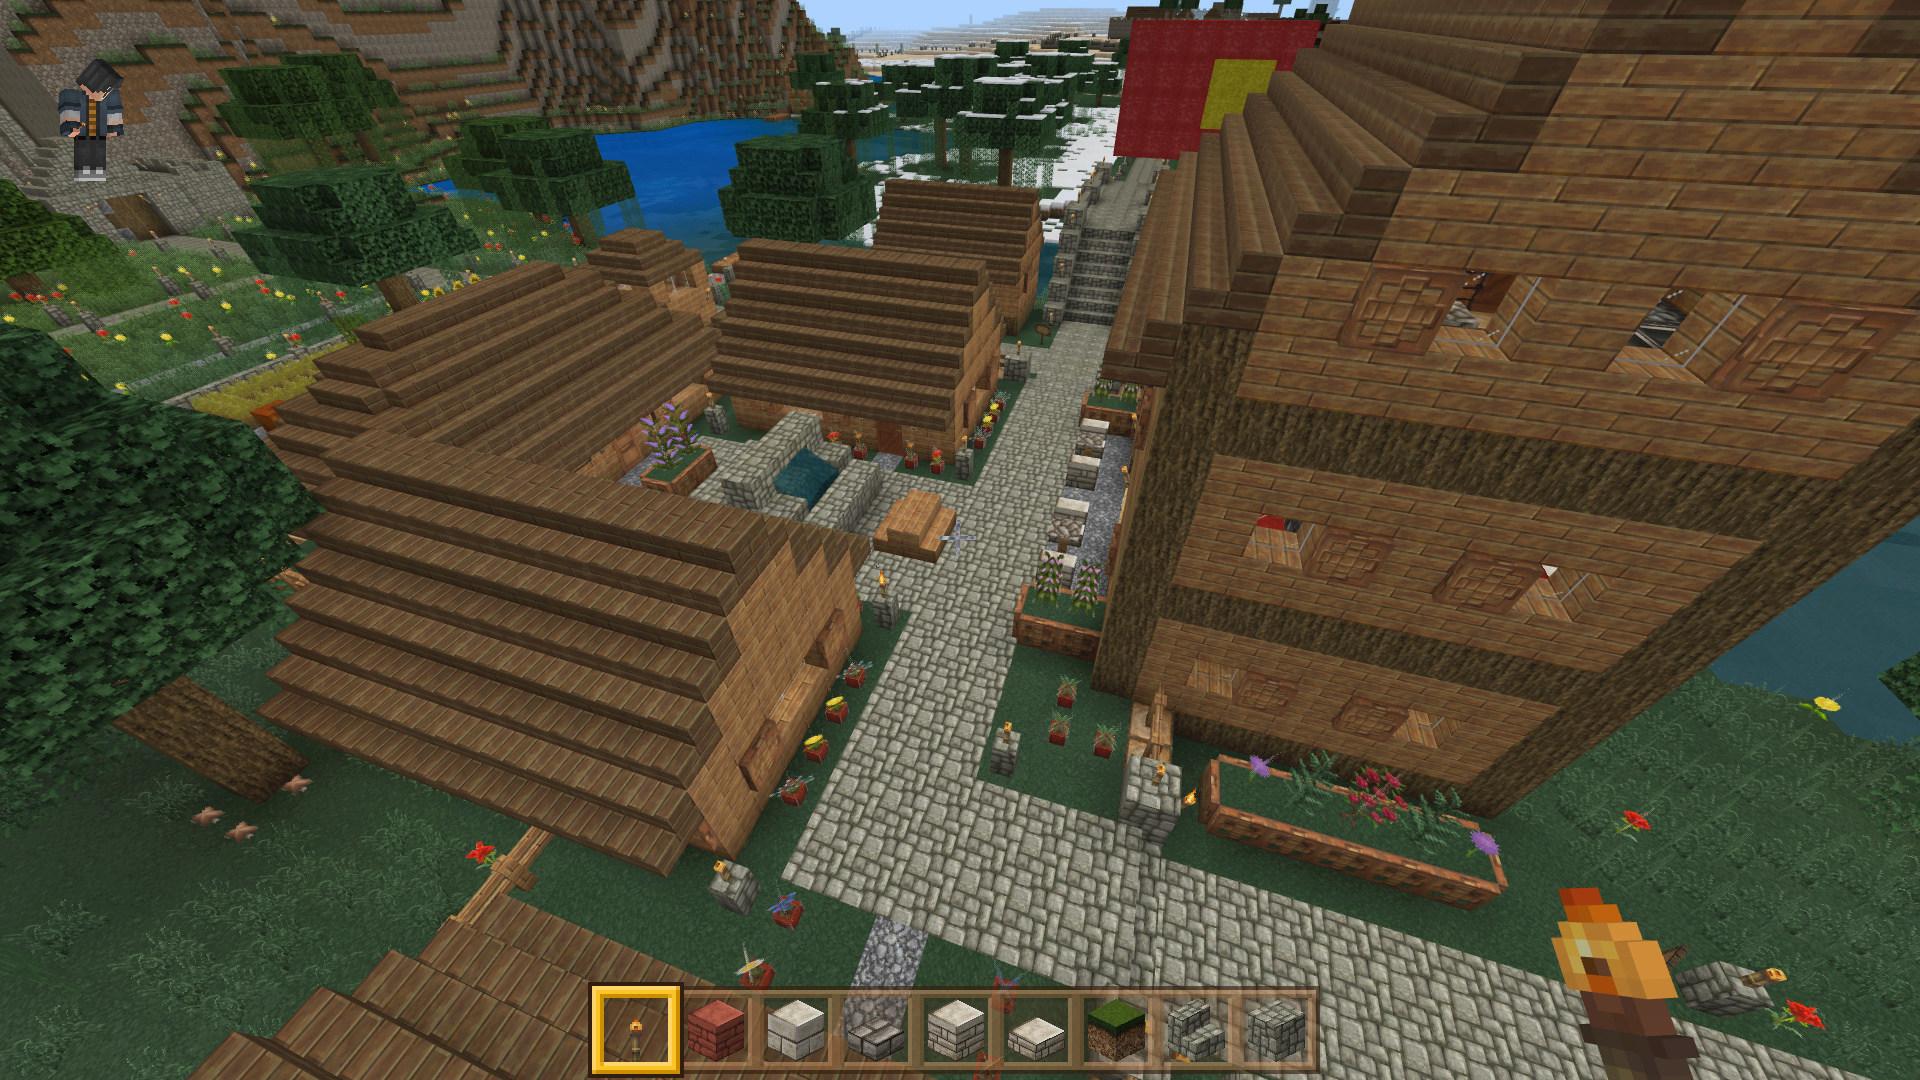 [Minecraft] Région centrale du Royaume d'Eboniya 31-08-16